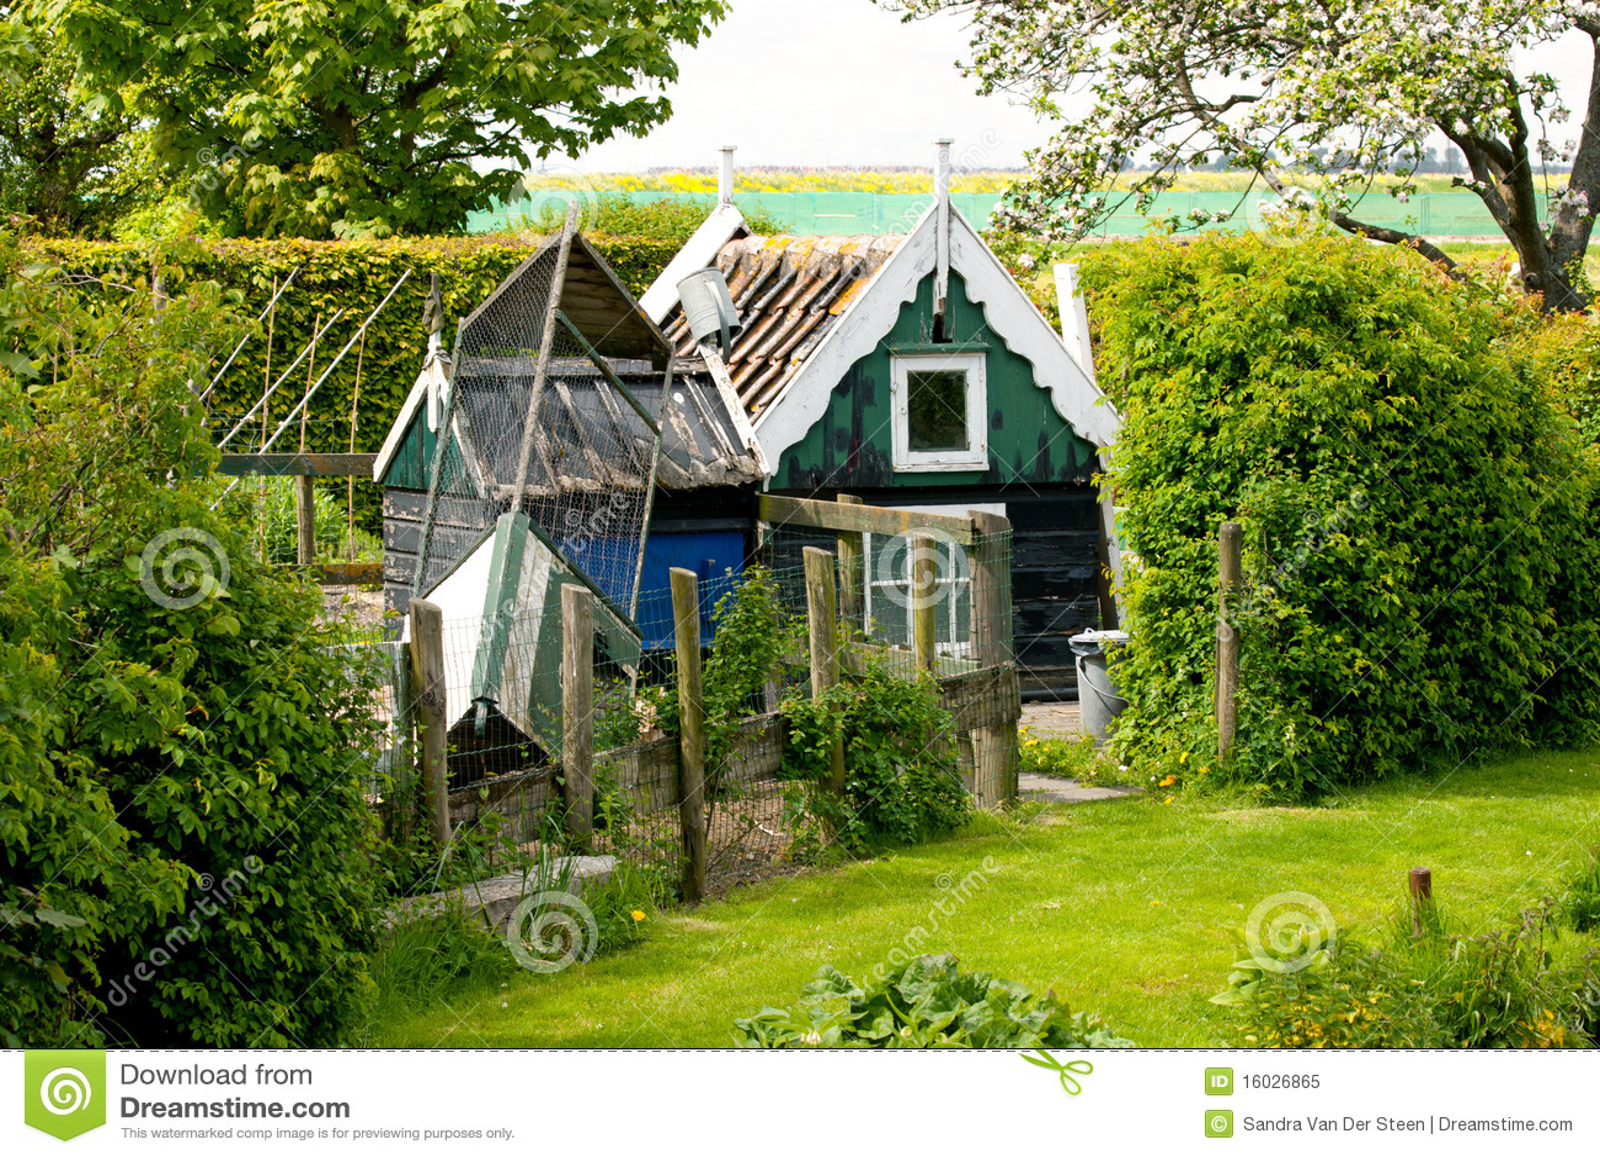 Little Old Animal Livestock Barn Stock Image - Image of ...